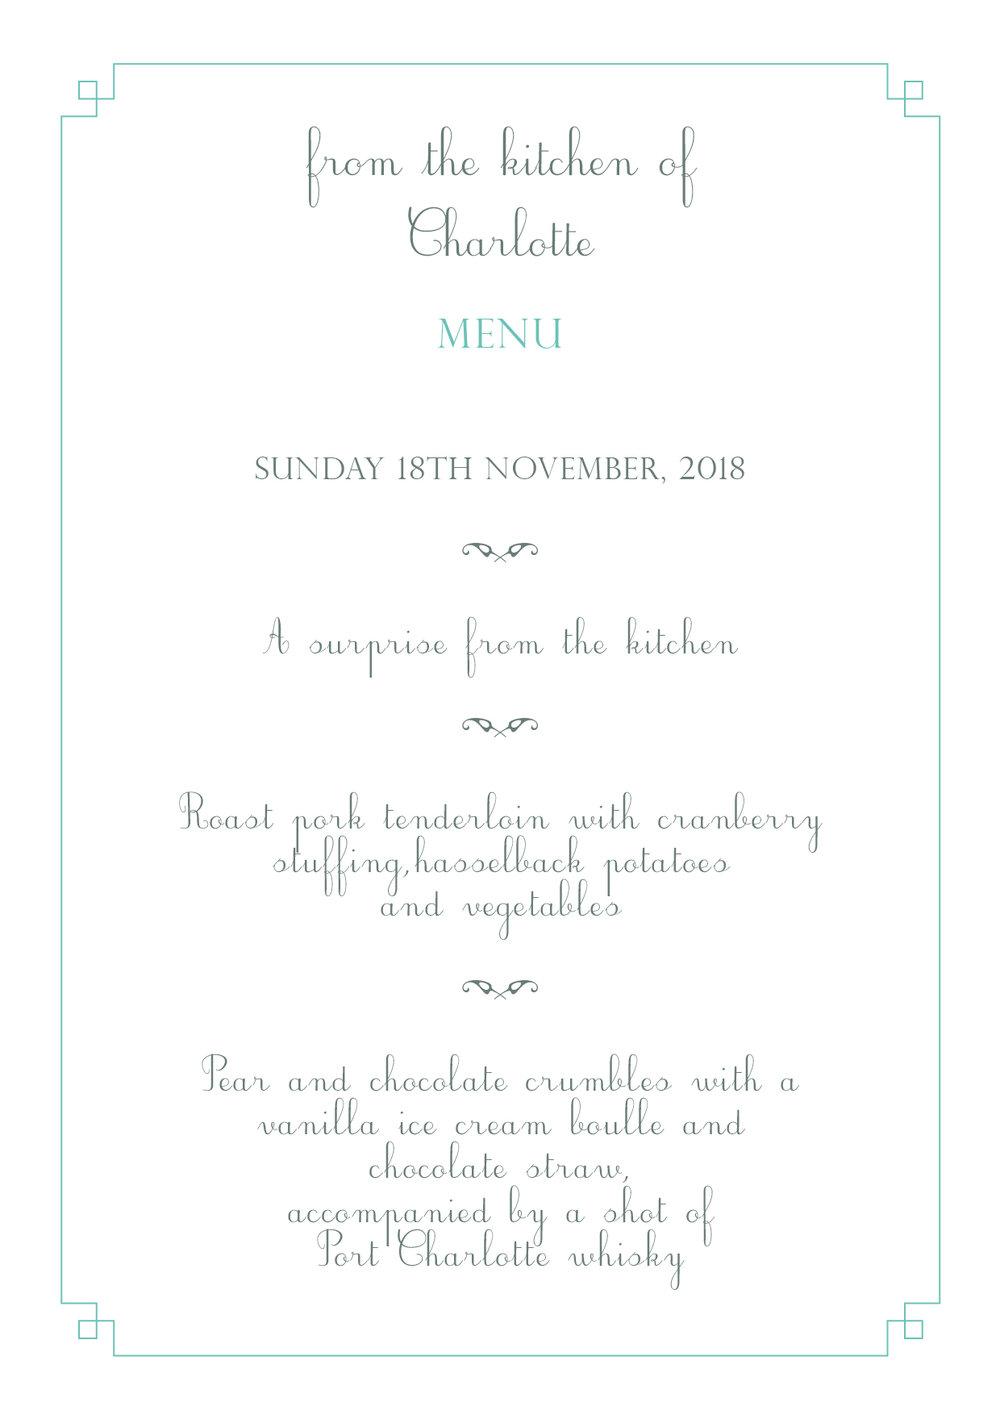 Charlotte's menus 18.11.18.jpg